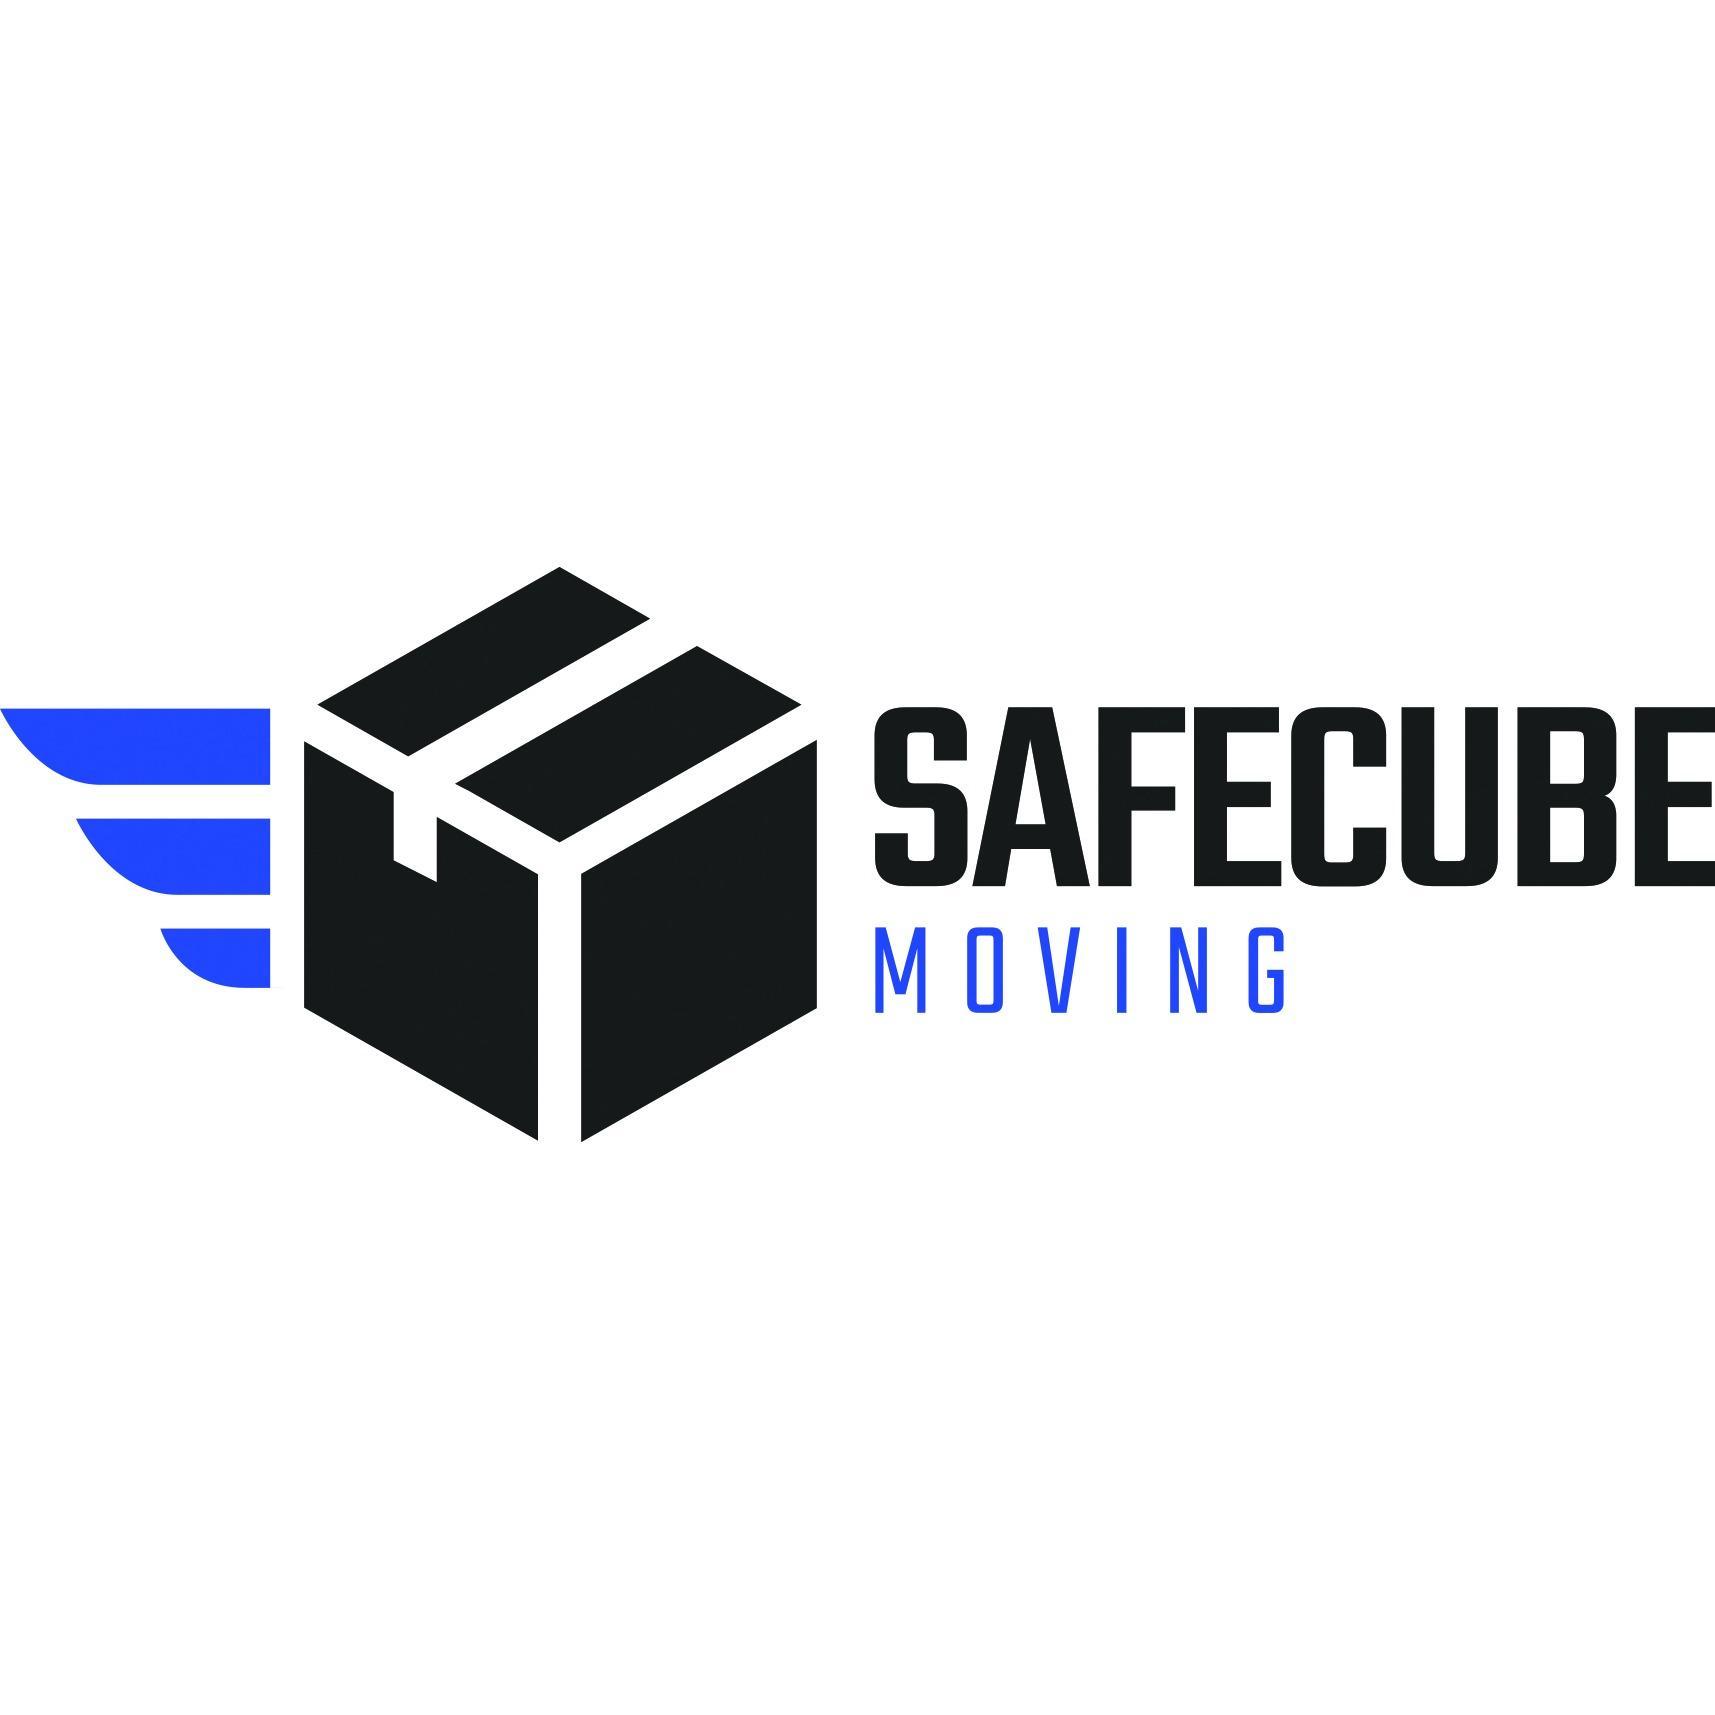 SafeCube Moving